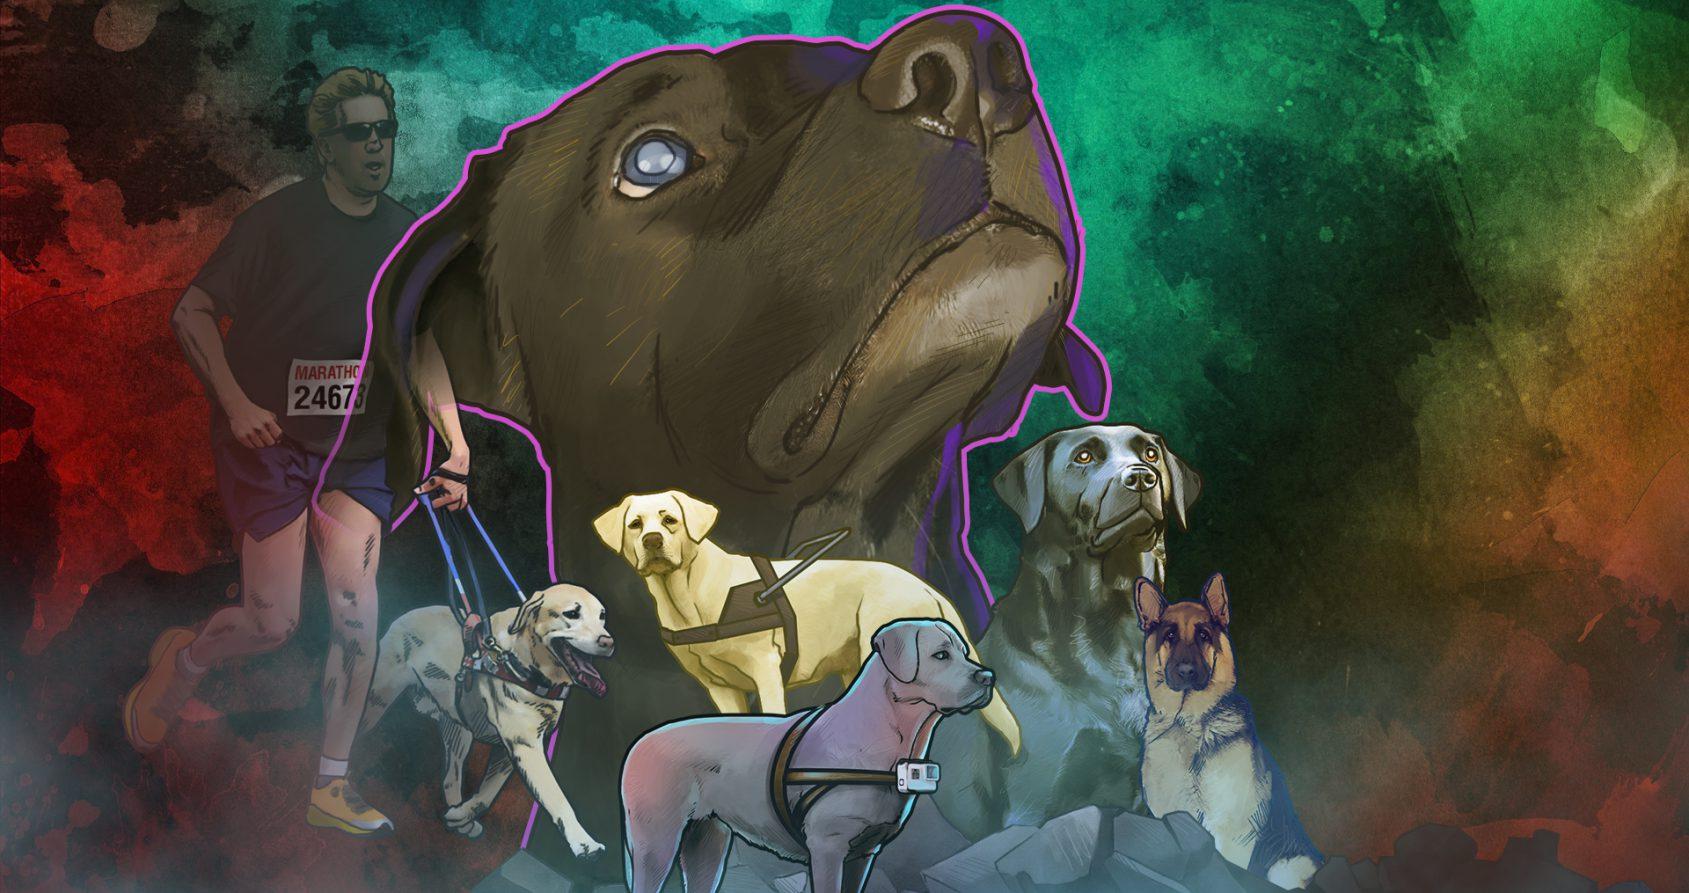 Chiens héros: 6 incroyables histoires de chiens guides